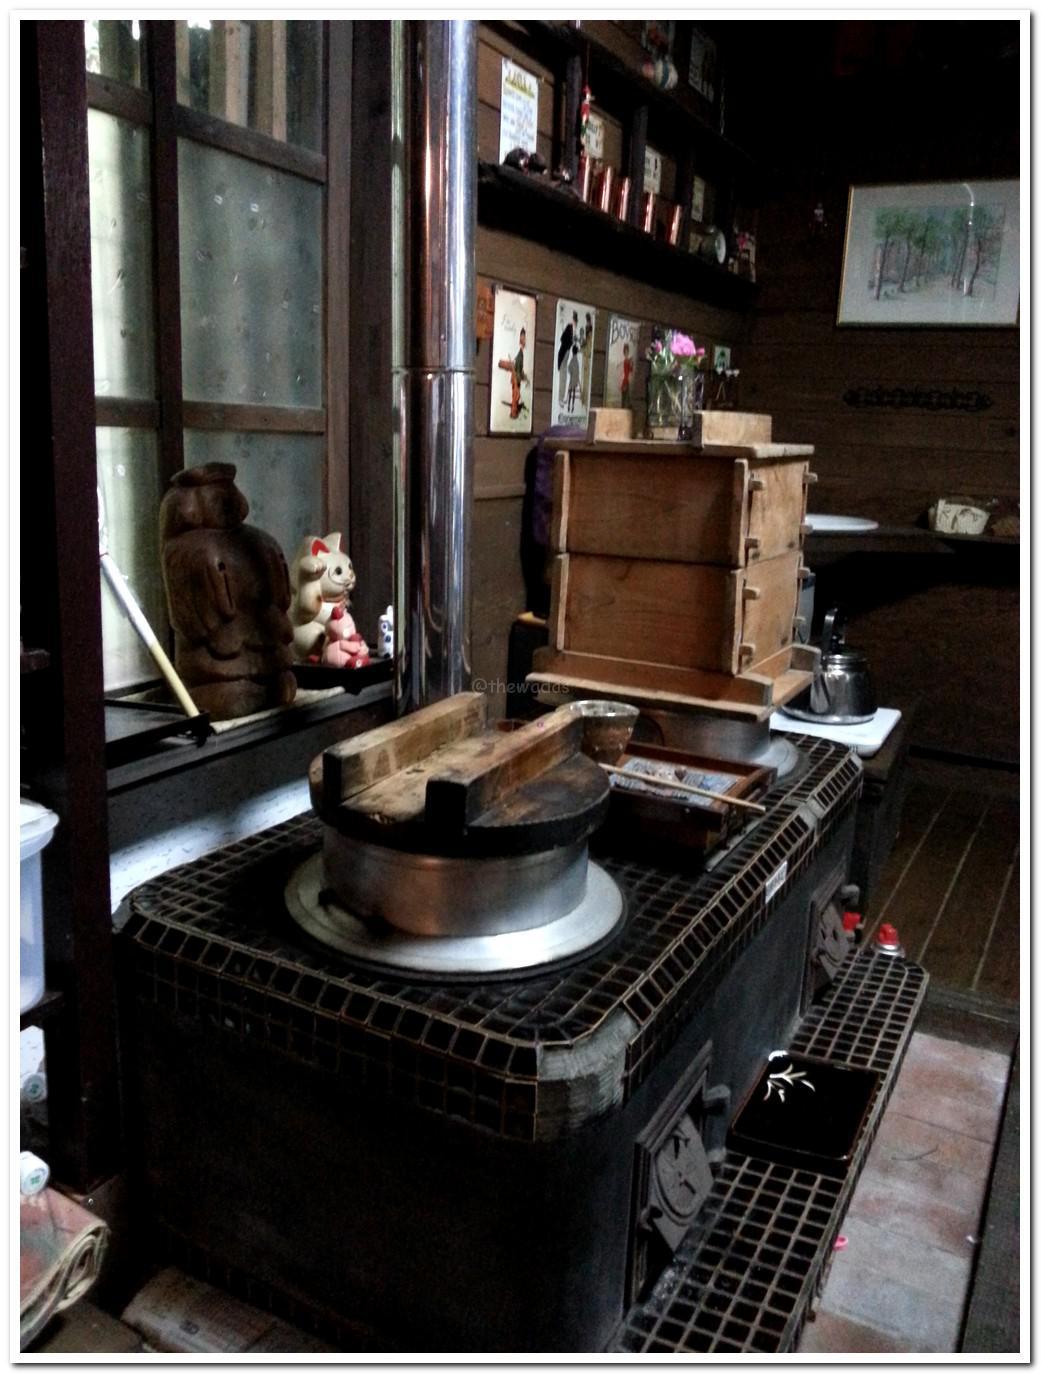 (more than) retro rice cooker!